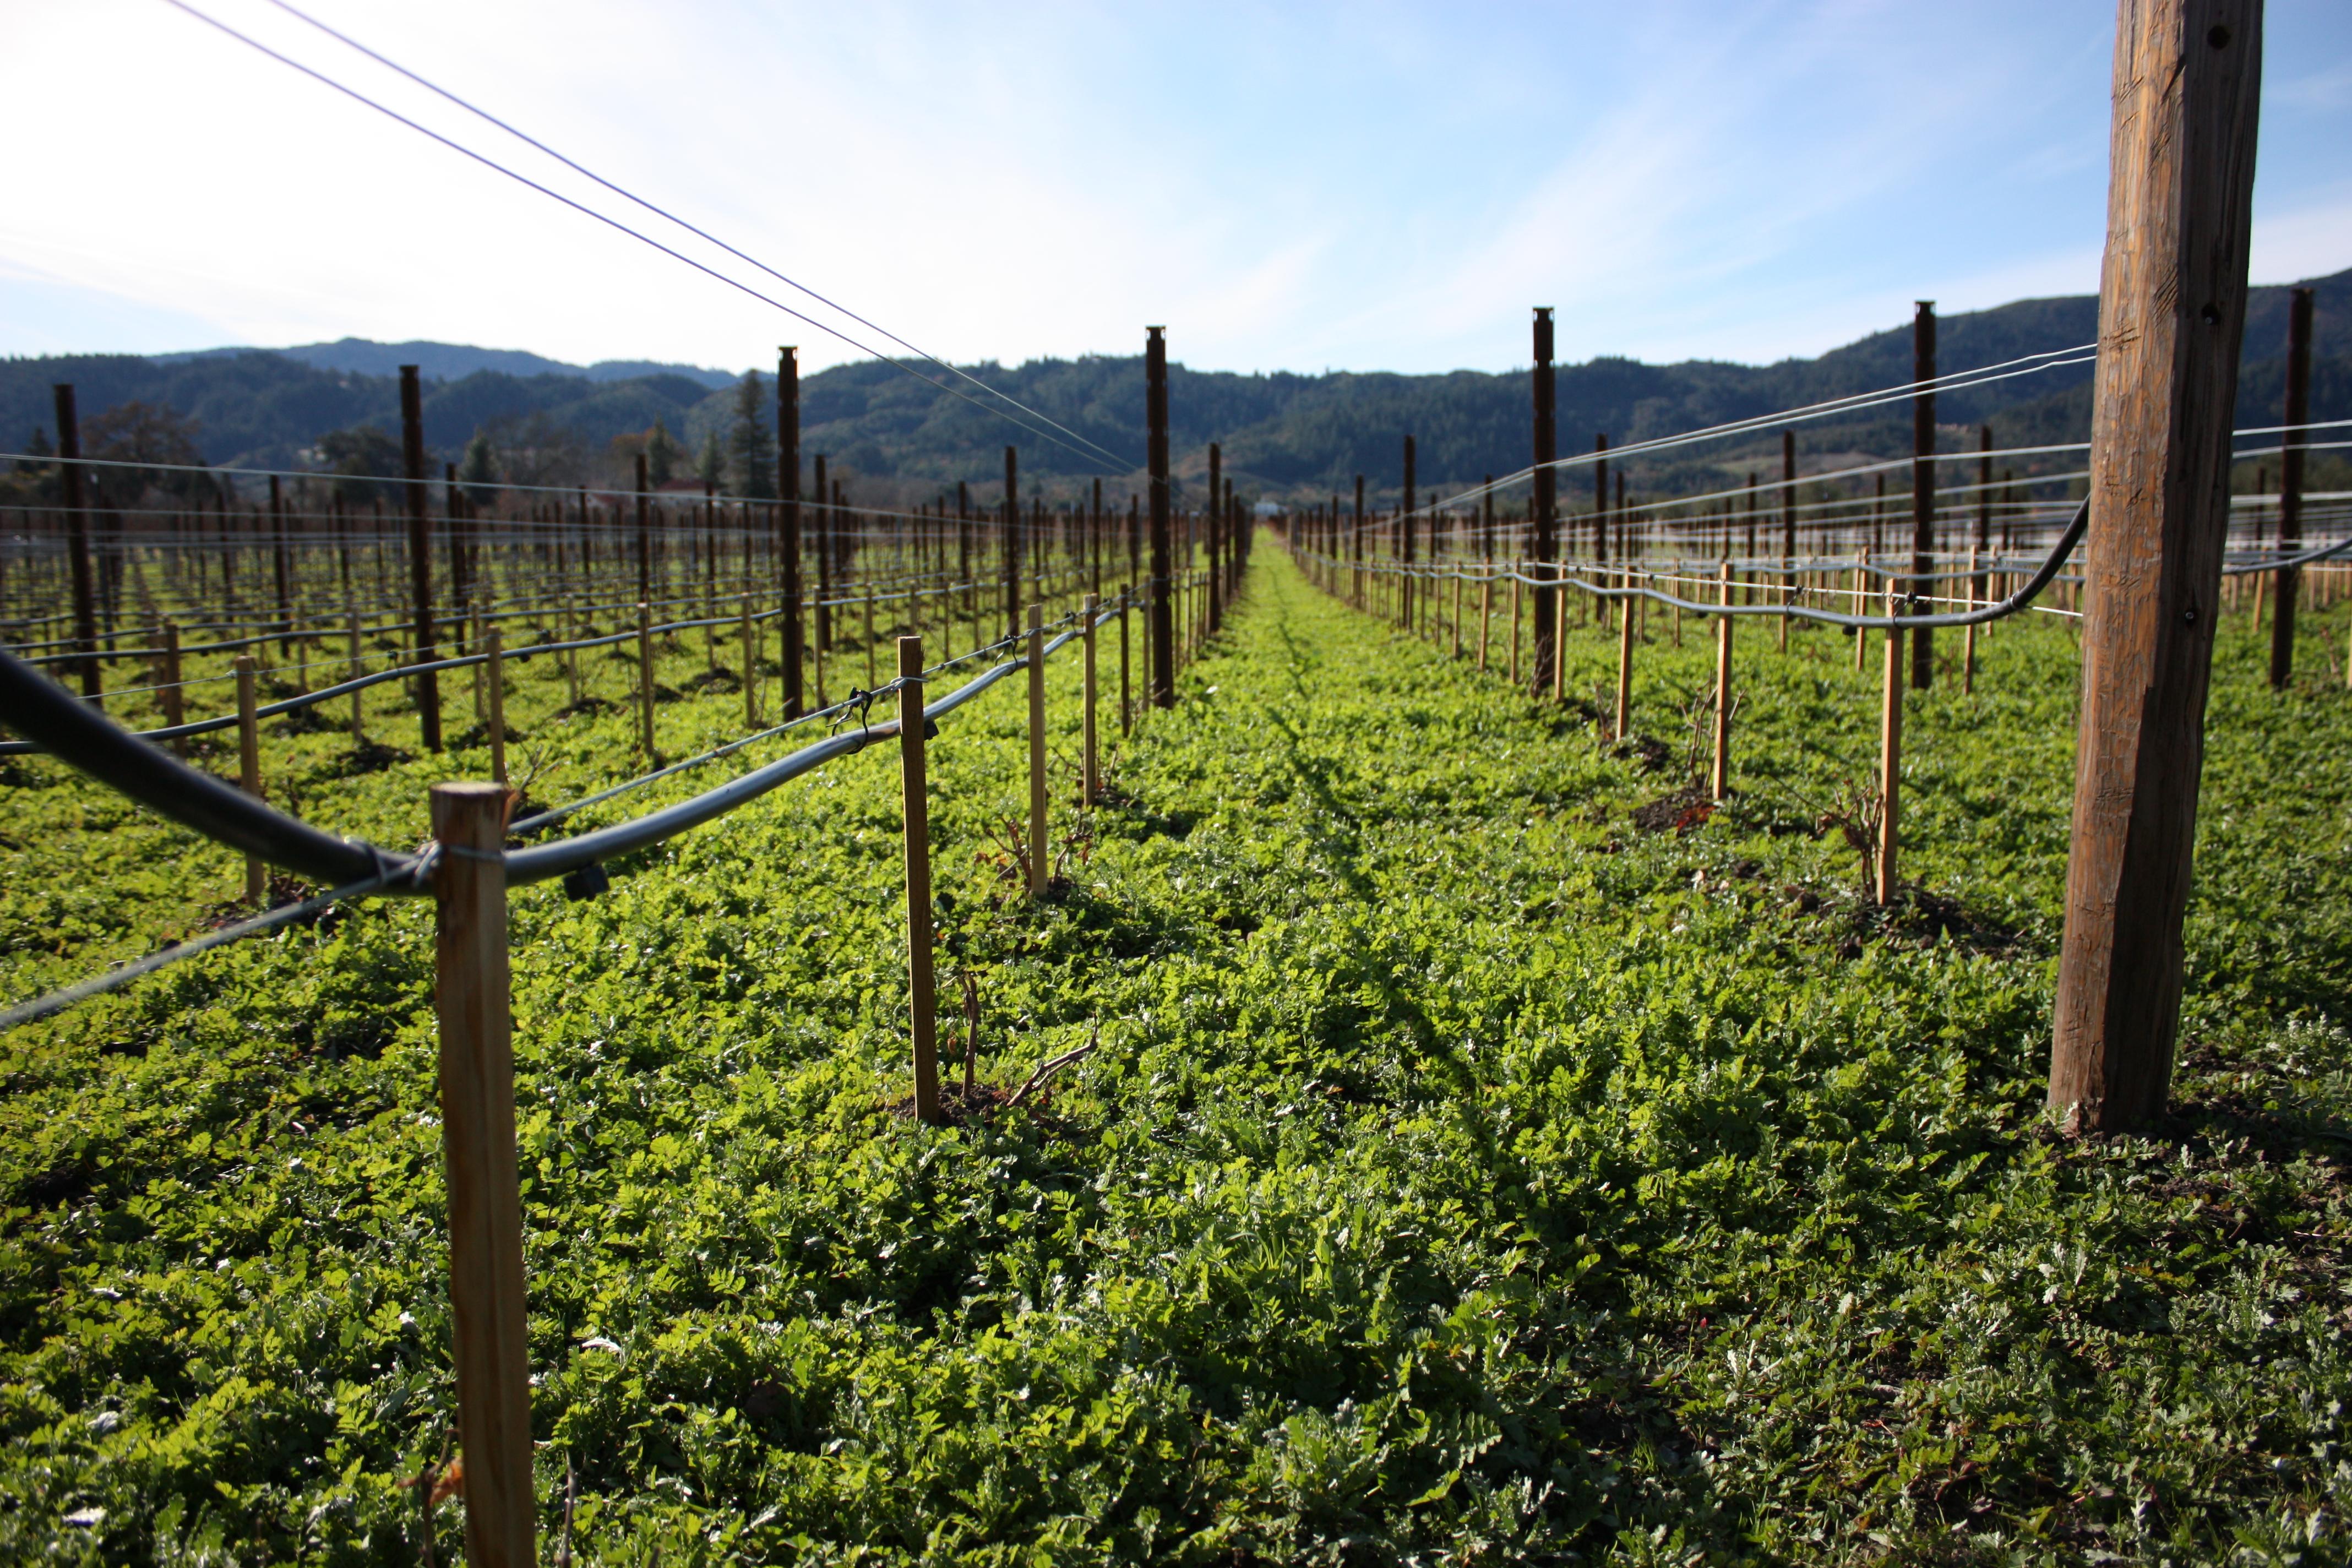 File:Close up of vineyard irrigation, wire trellising ...